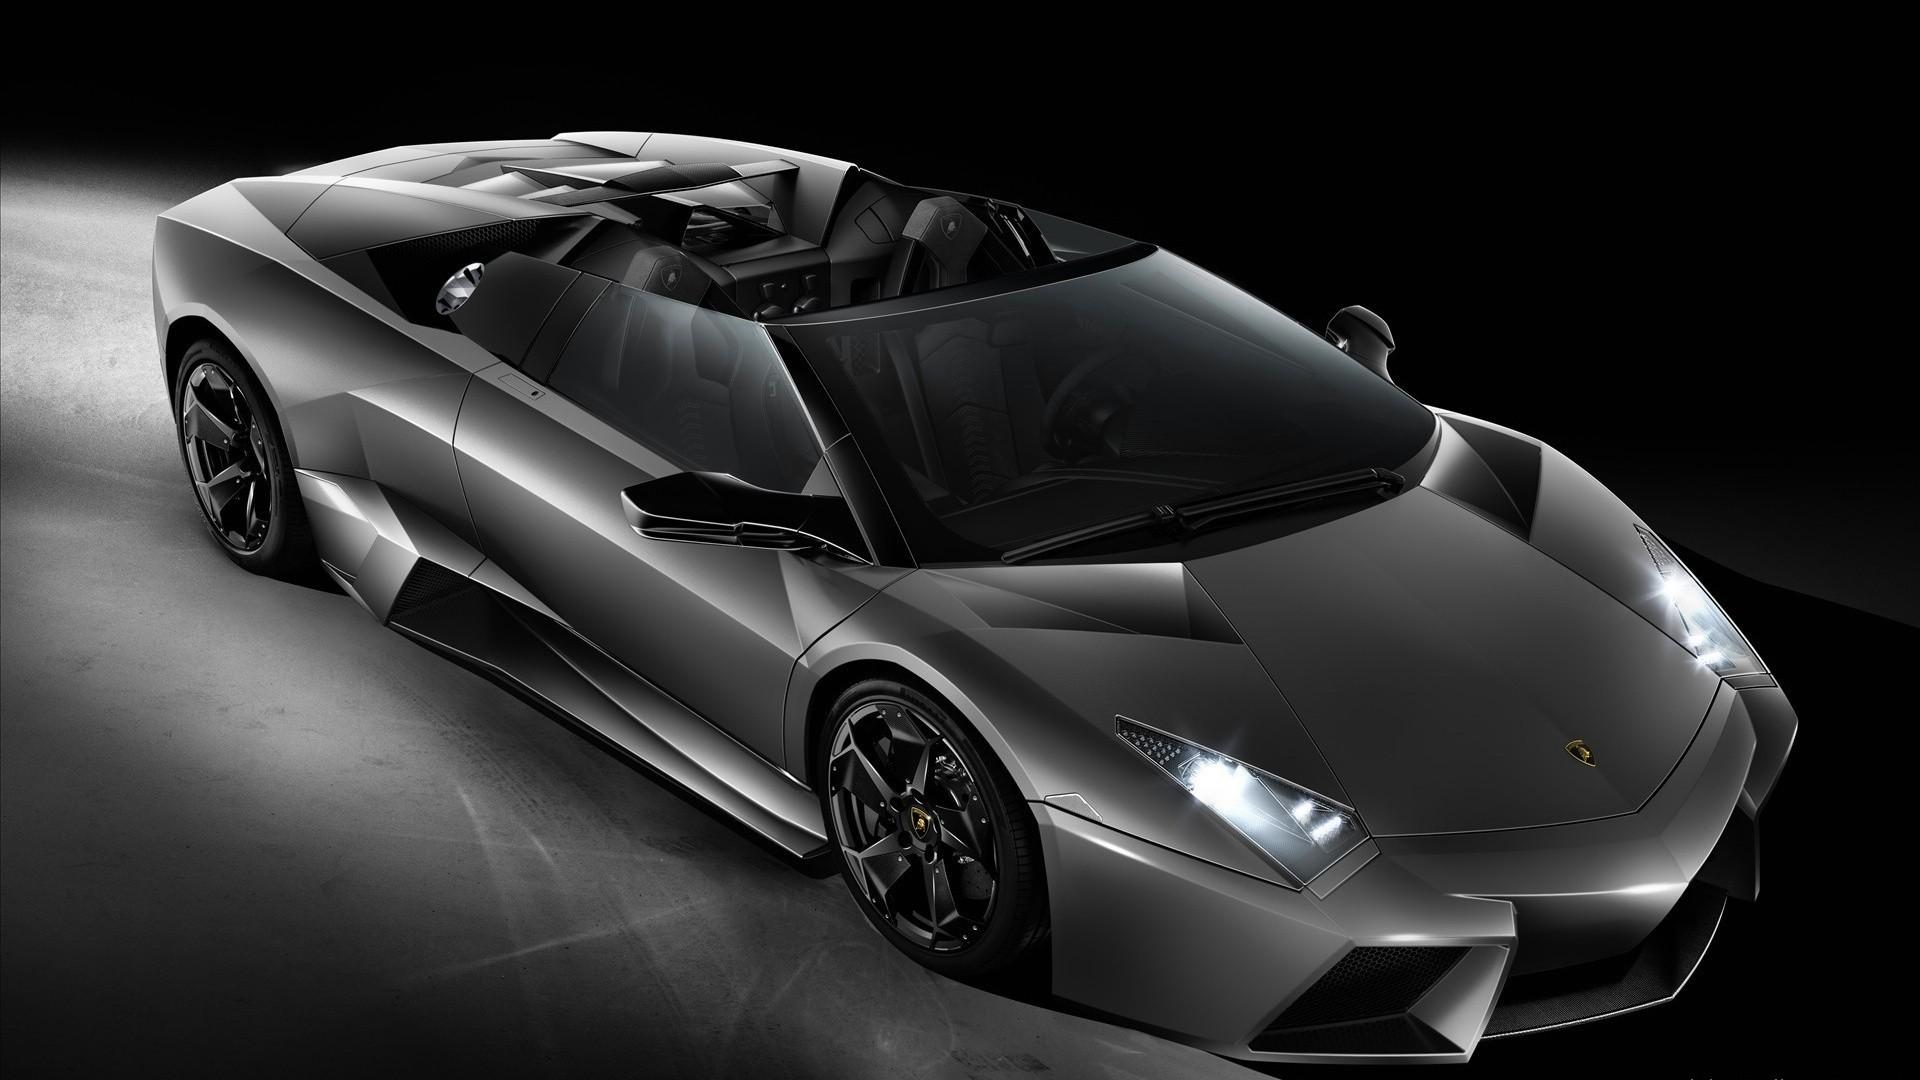 Car Vehicle Lamborghini Aventador Super Sports Silver Cars Performance Reventon Wheel